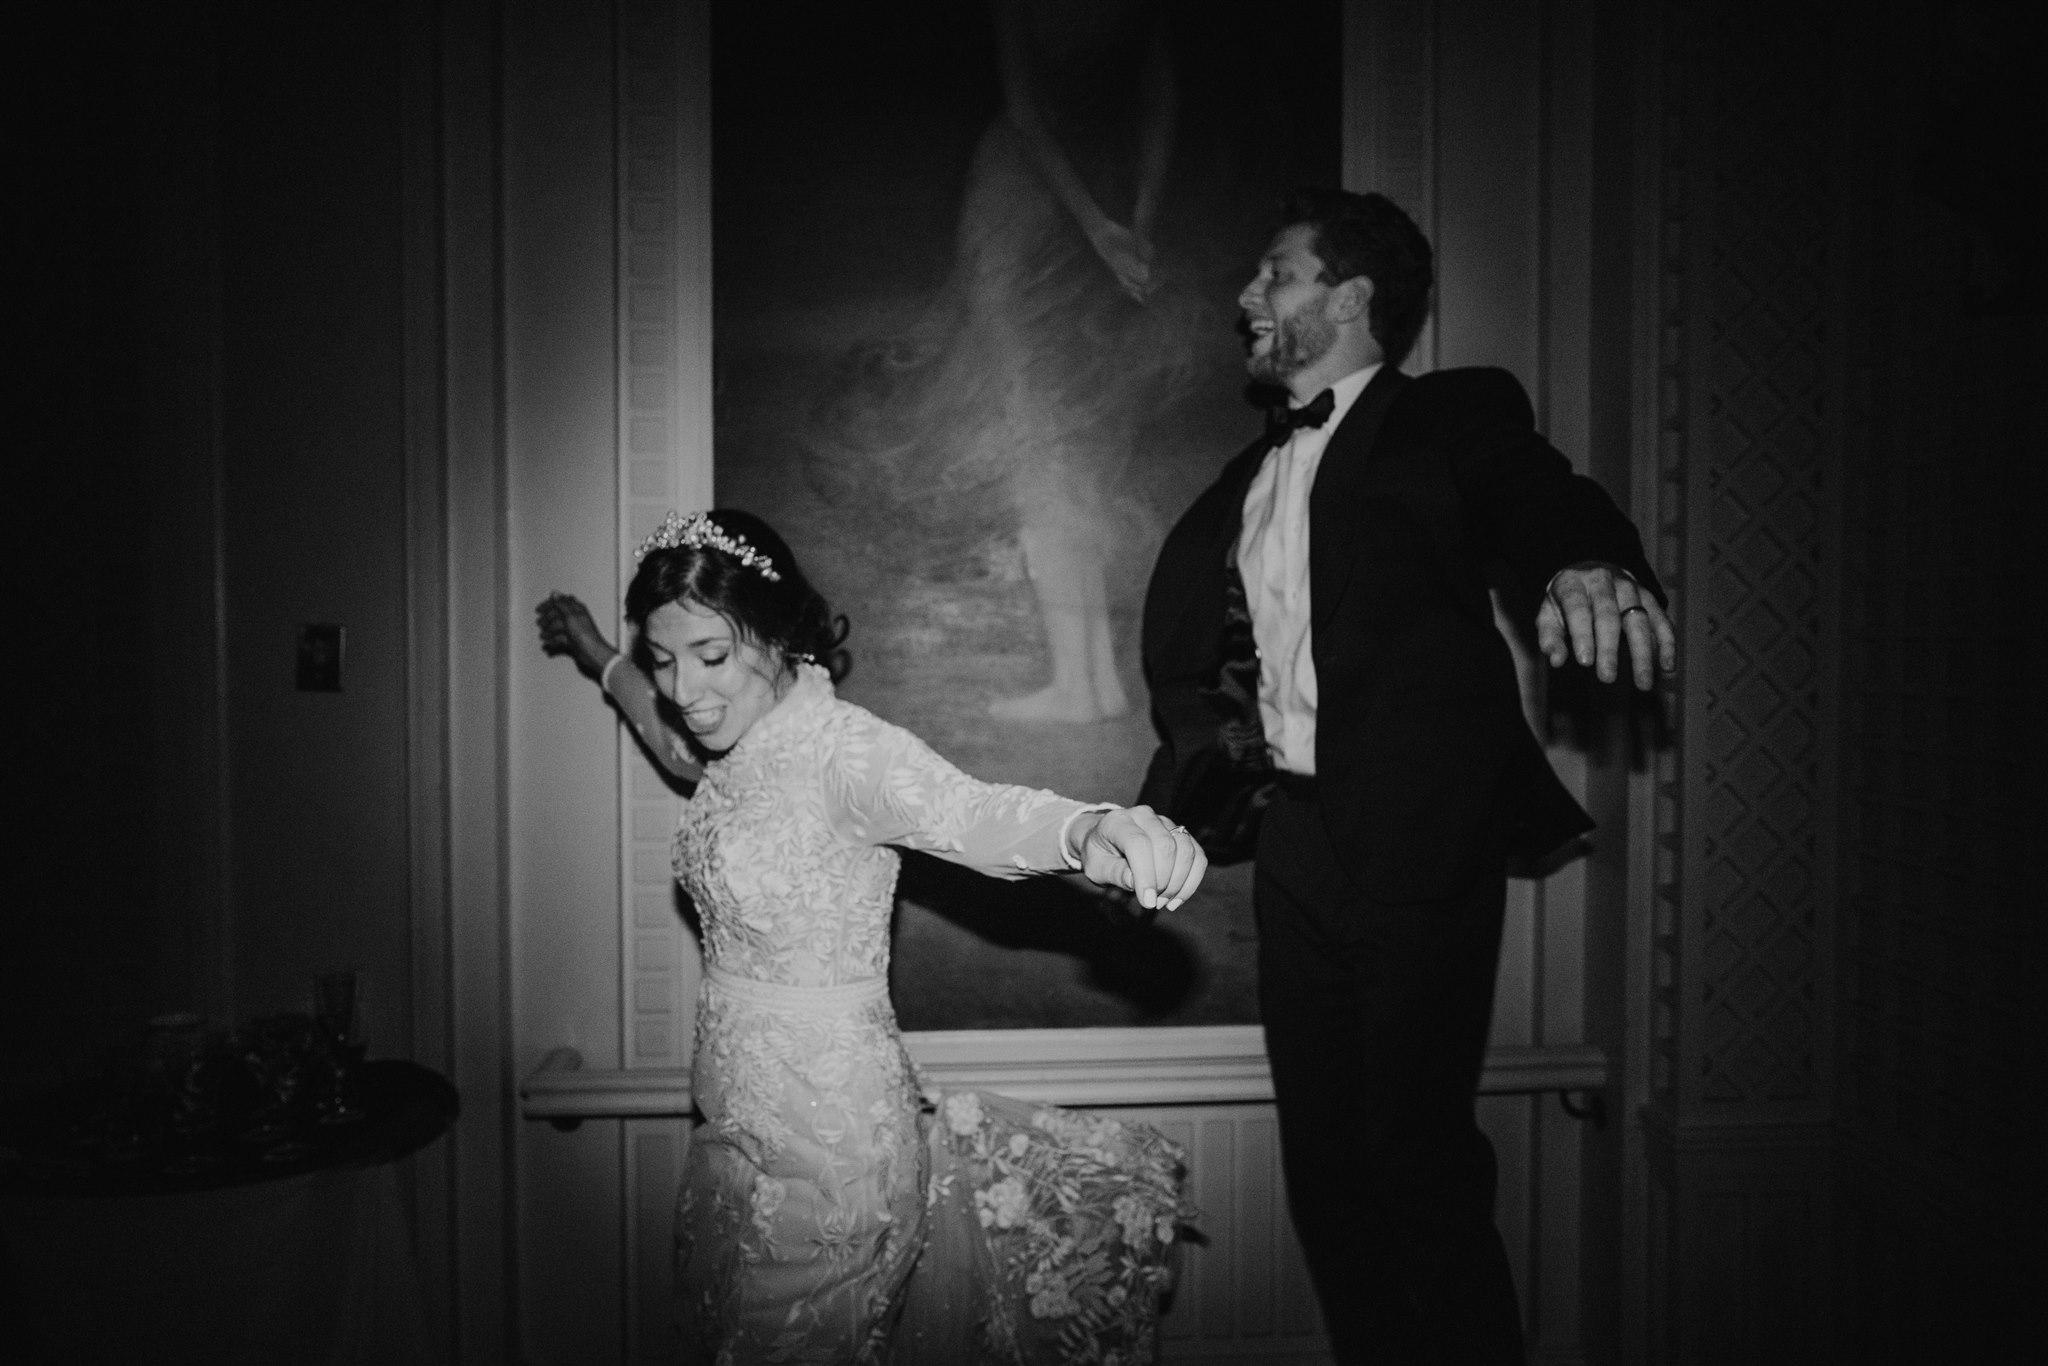 Chellise_Michael_Photography_Hudson_Valley_Wedding_Photographer_Otesaga_Hotel-6290.jpg